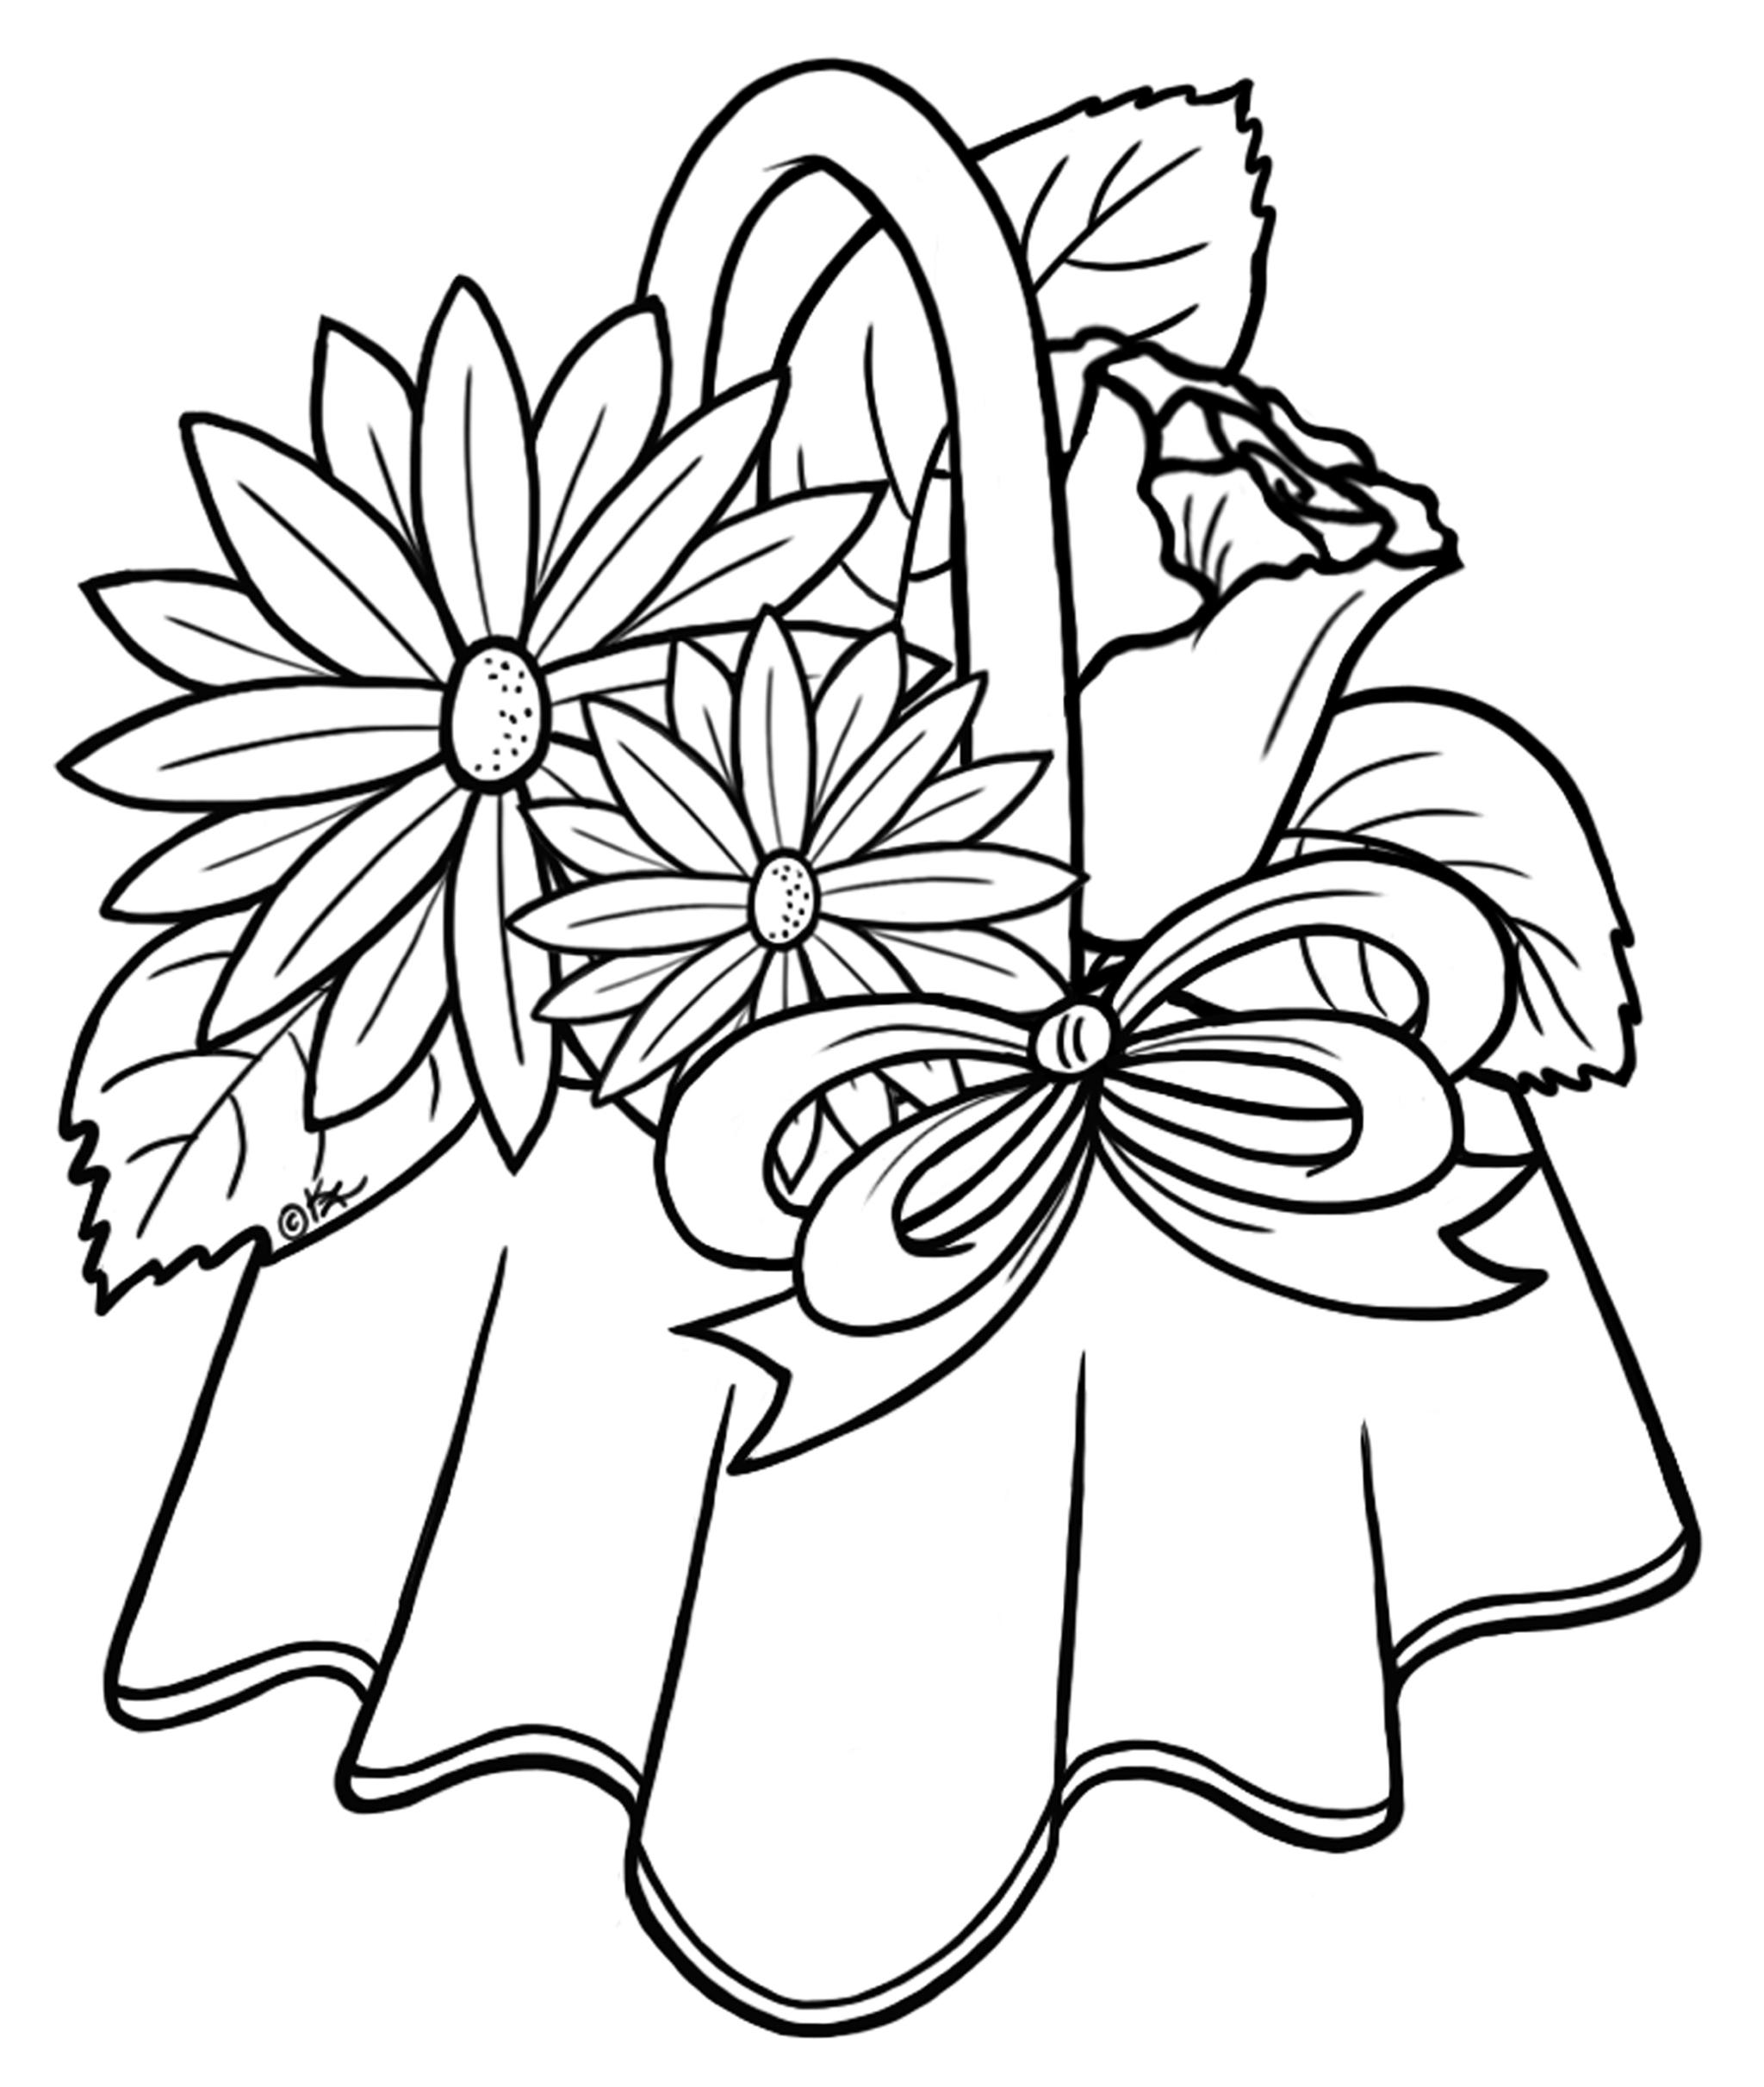 Simple Flower Basket Drawing : Flower bouquet drawings clipart best